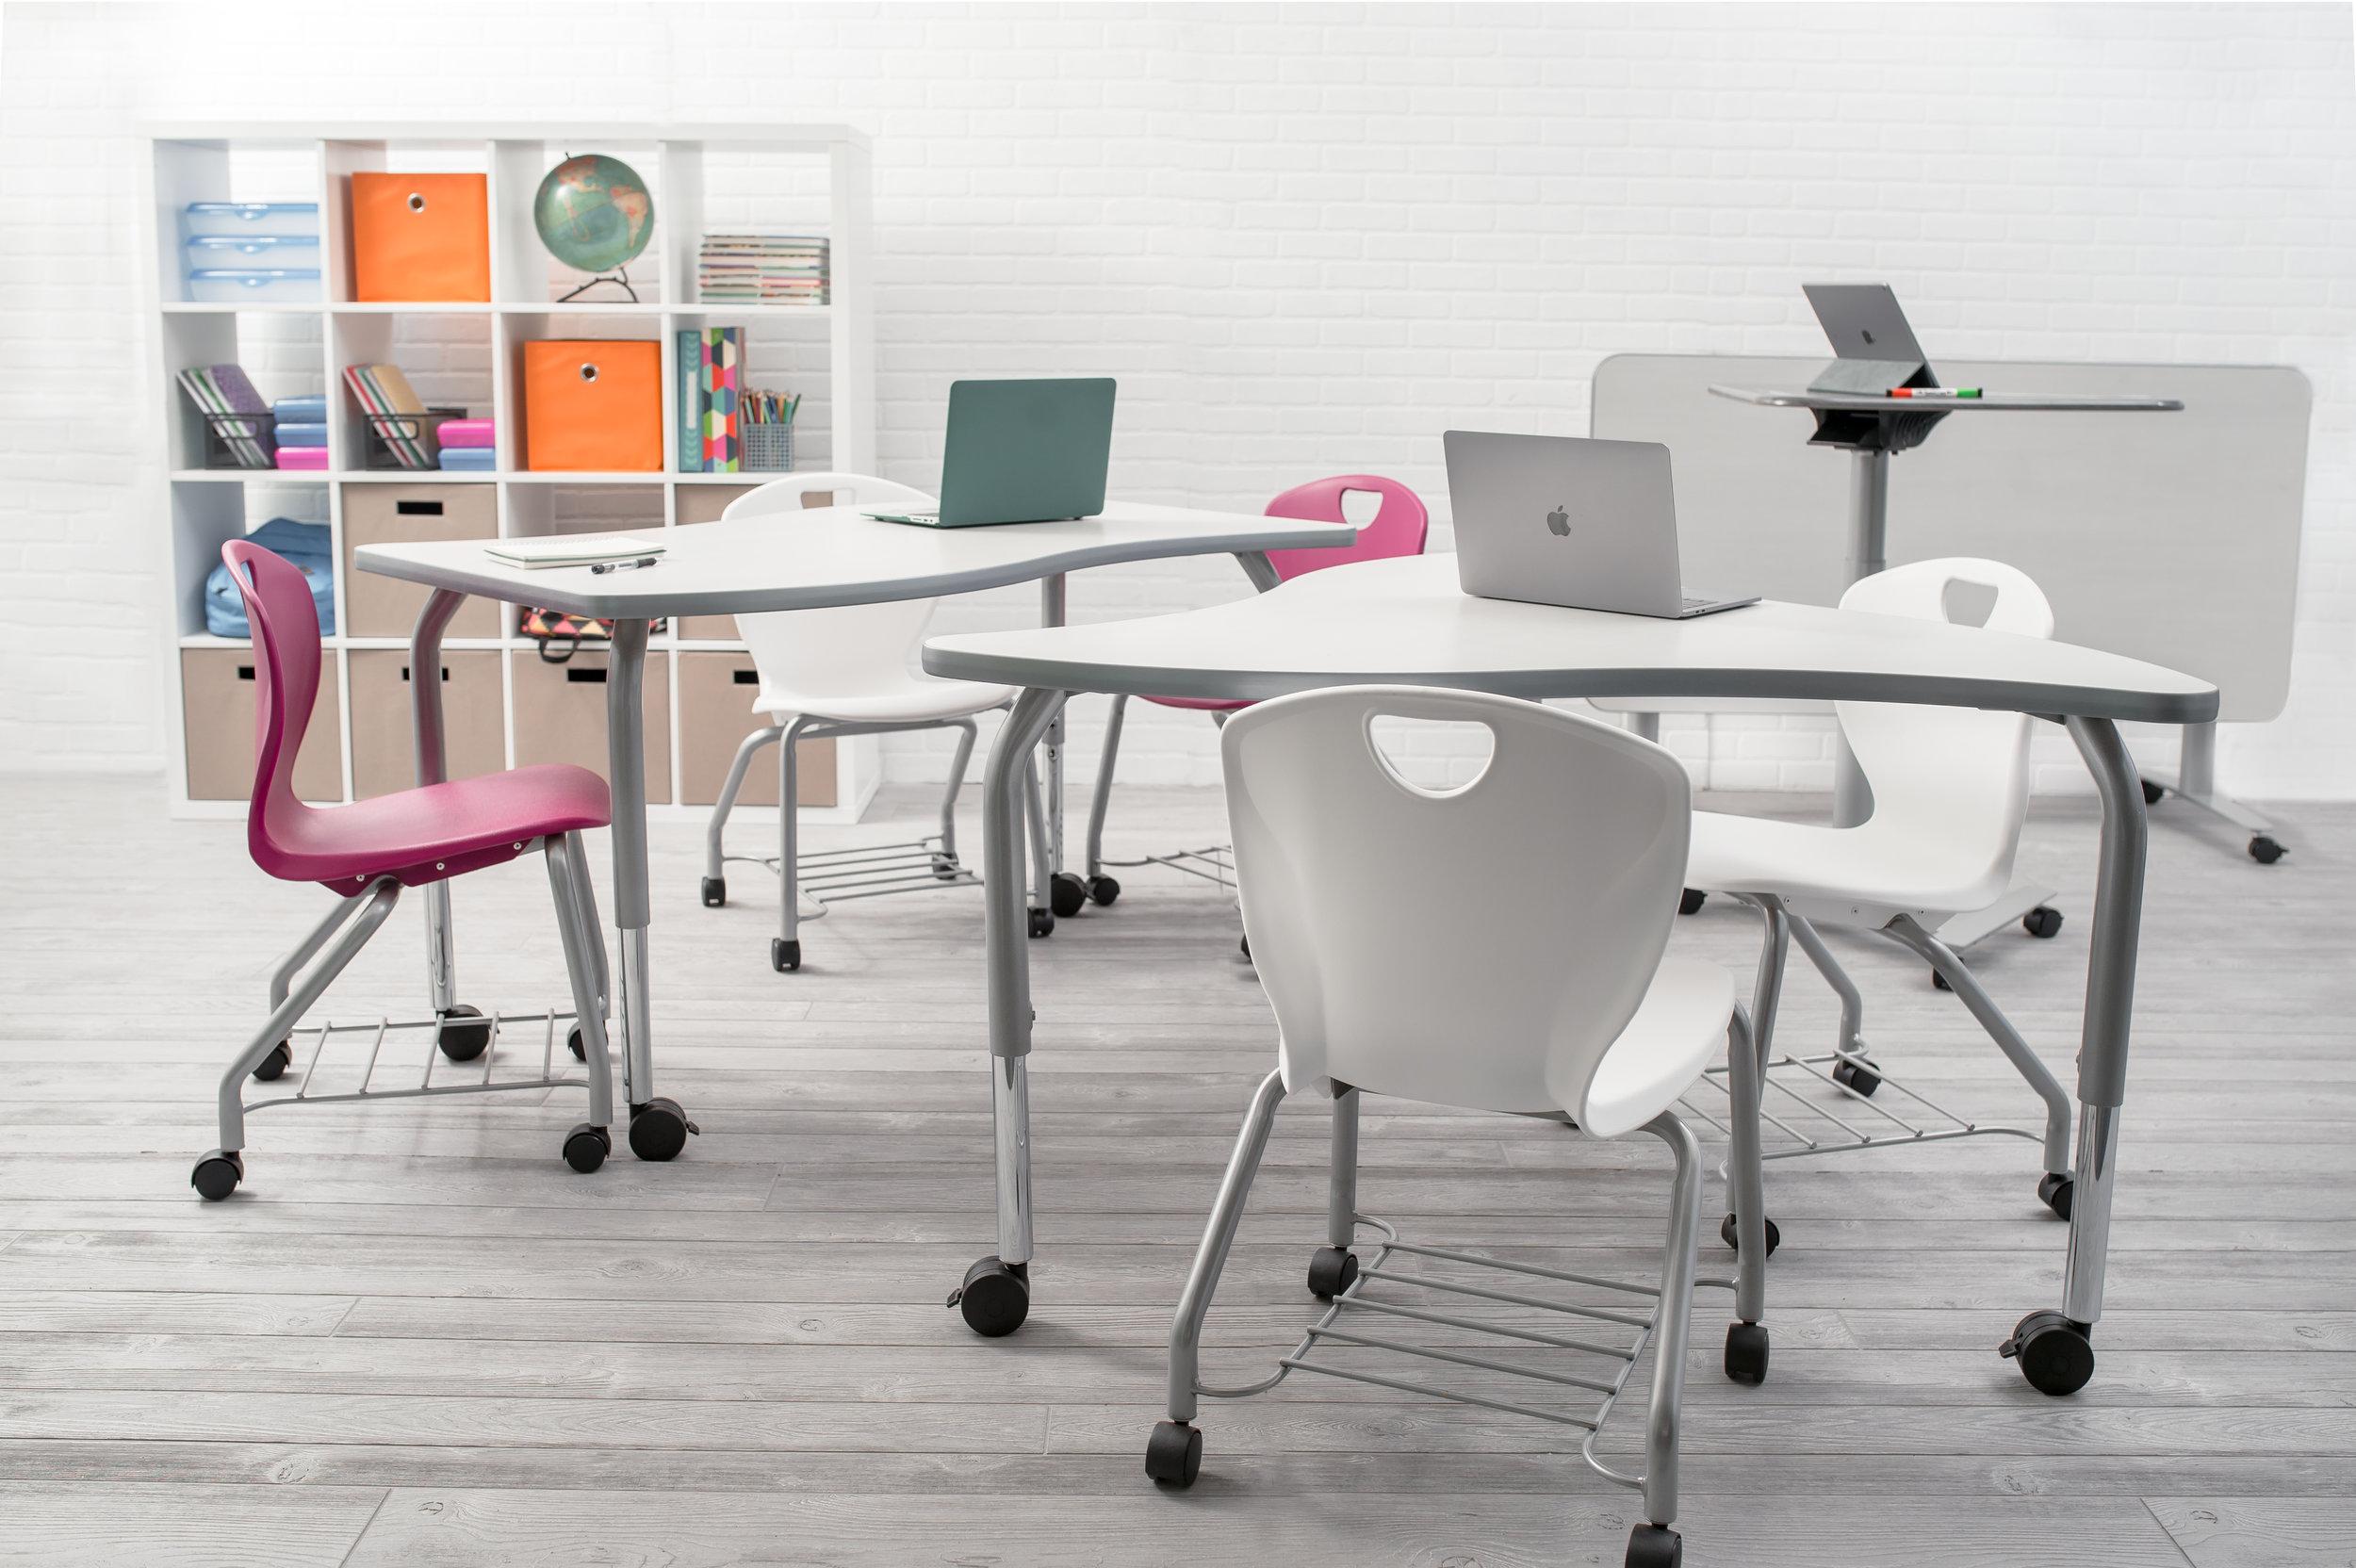 Undulate and Ambit Table.jpg